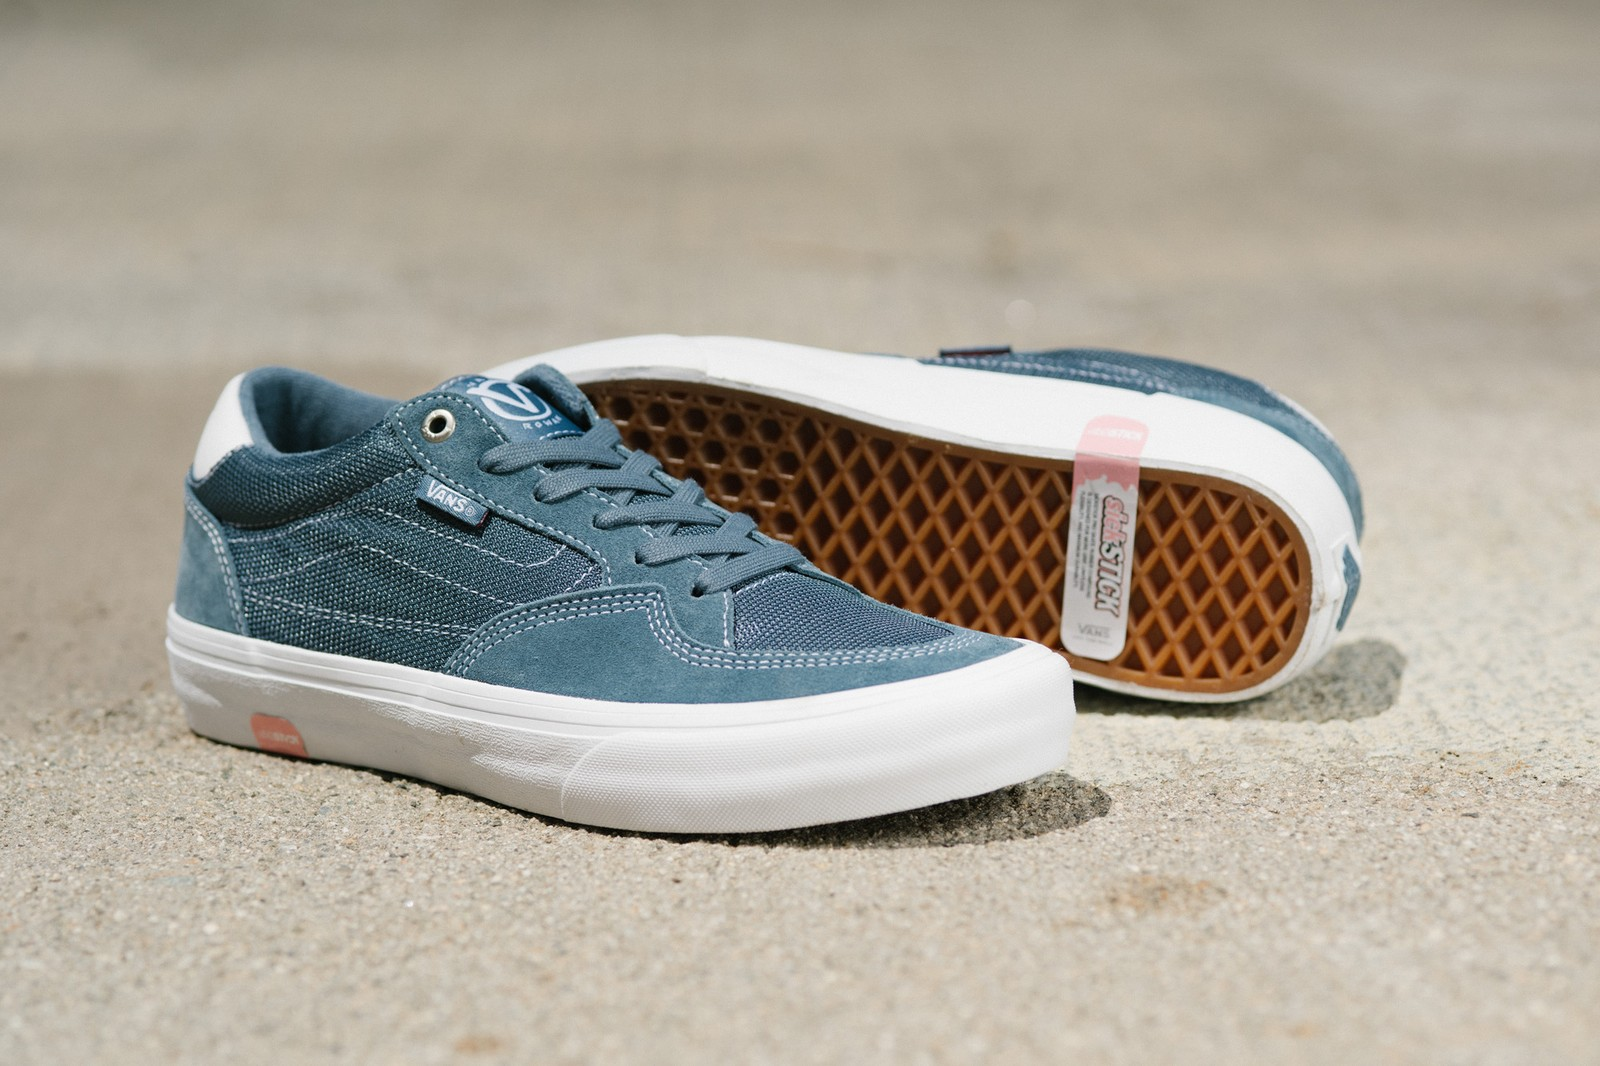 Vans Introduces Rowan Zorilla's First Signature Pro Shoe